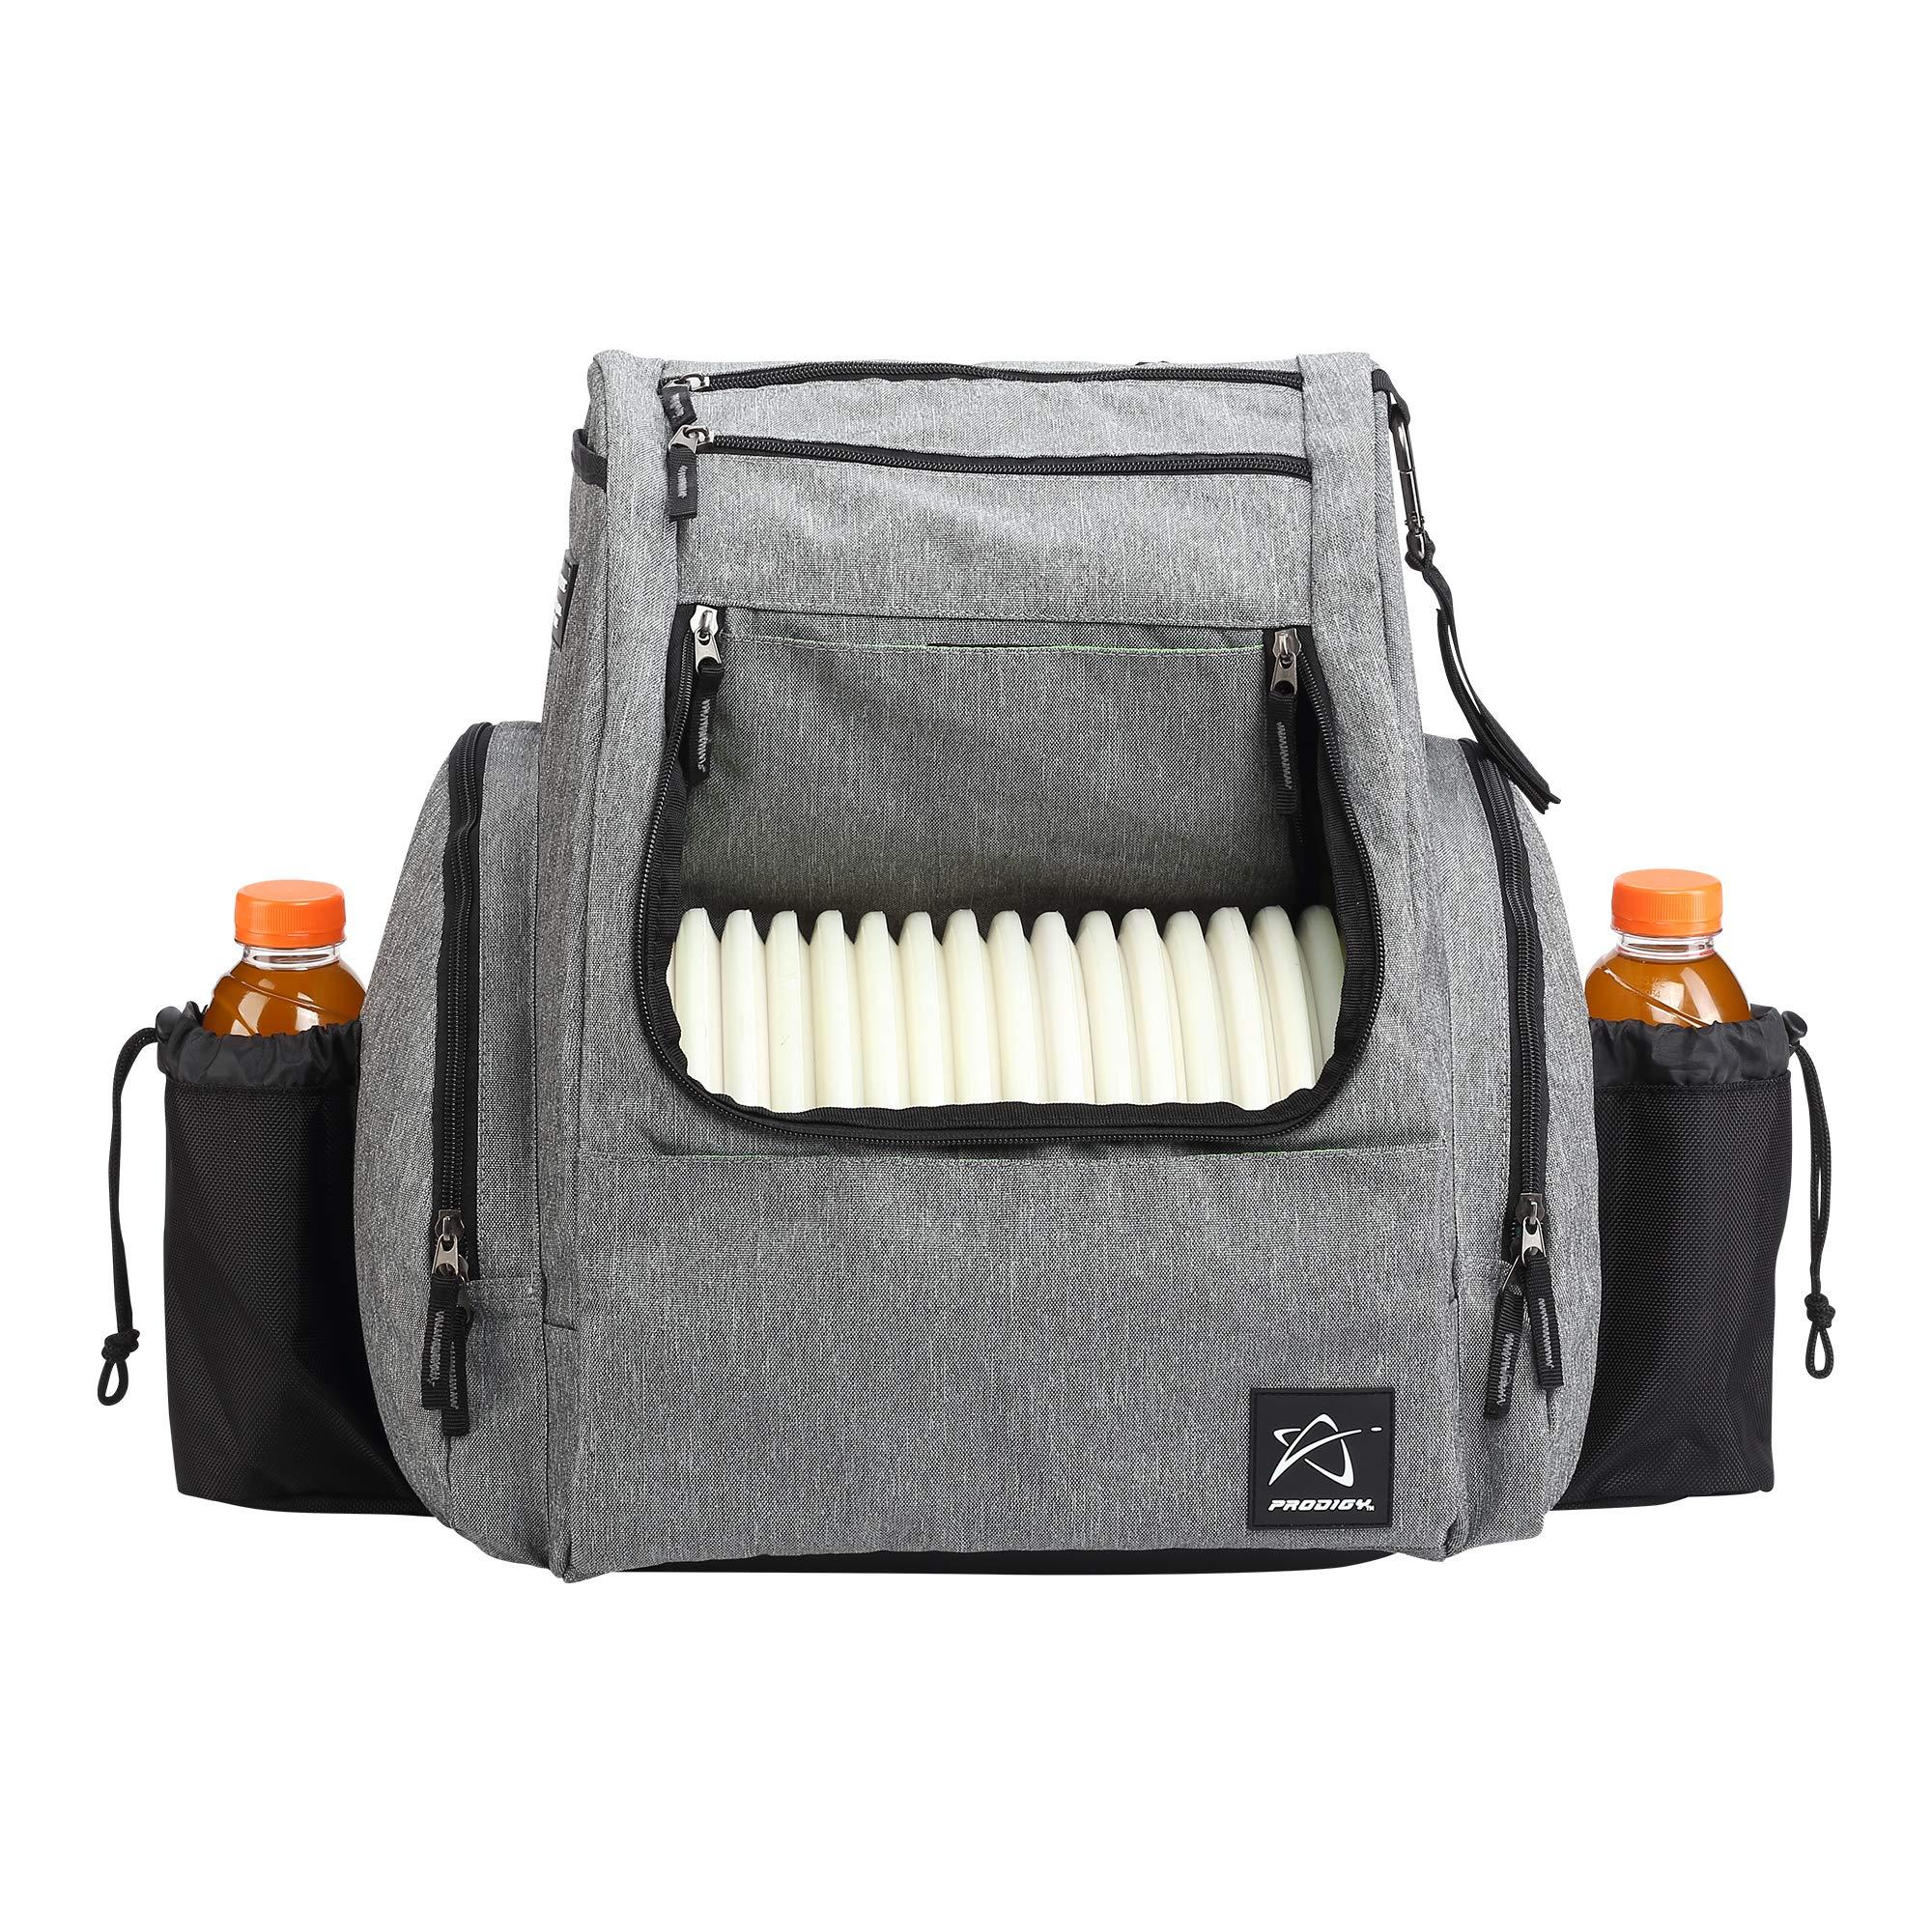 Prodigy Disc BP-2 Backpack - 2019 Model - Fits 25 Discs (Heather Gray/Black, Rainfly)